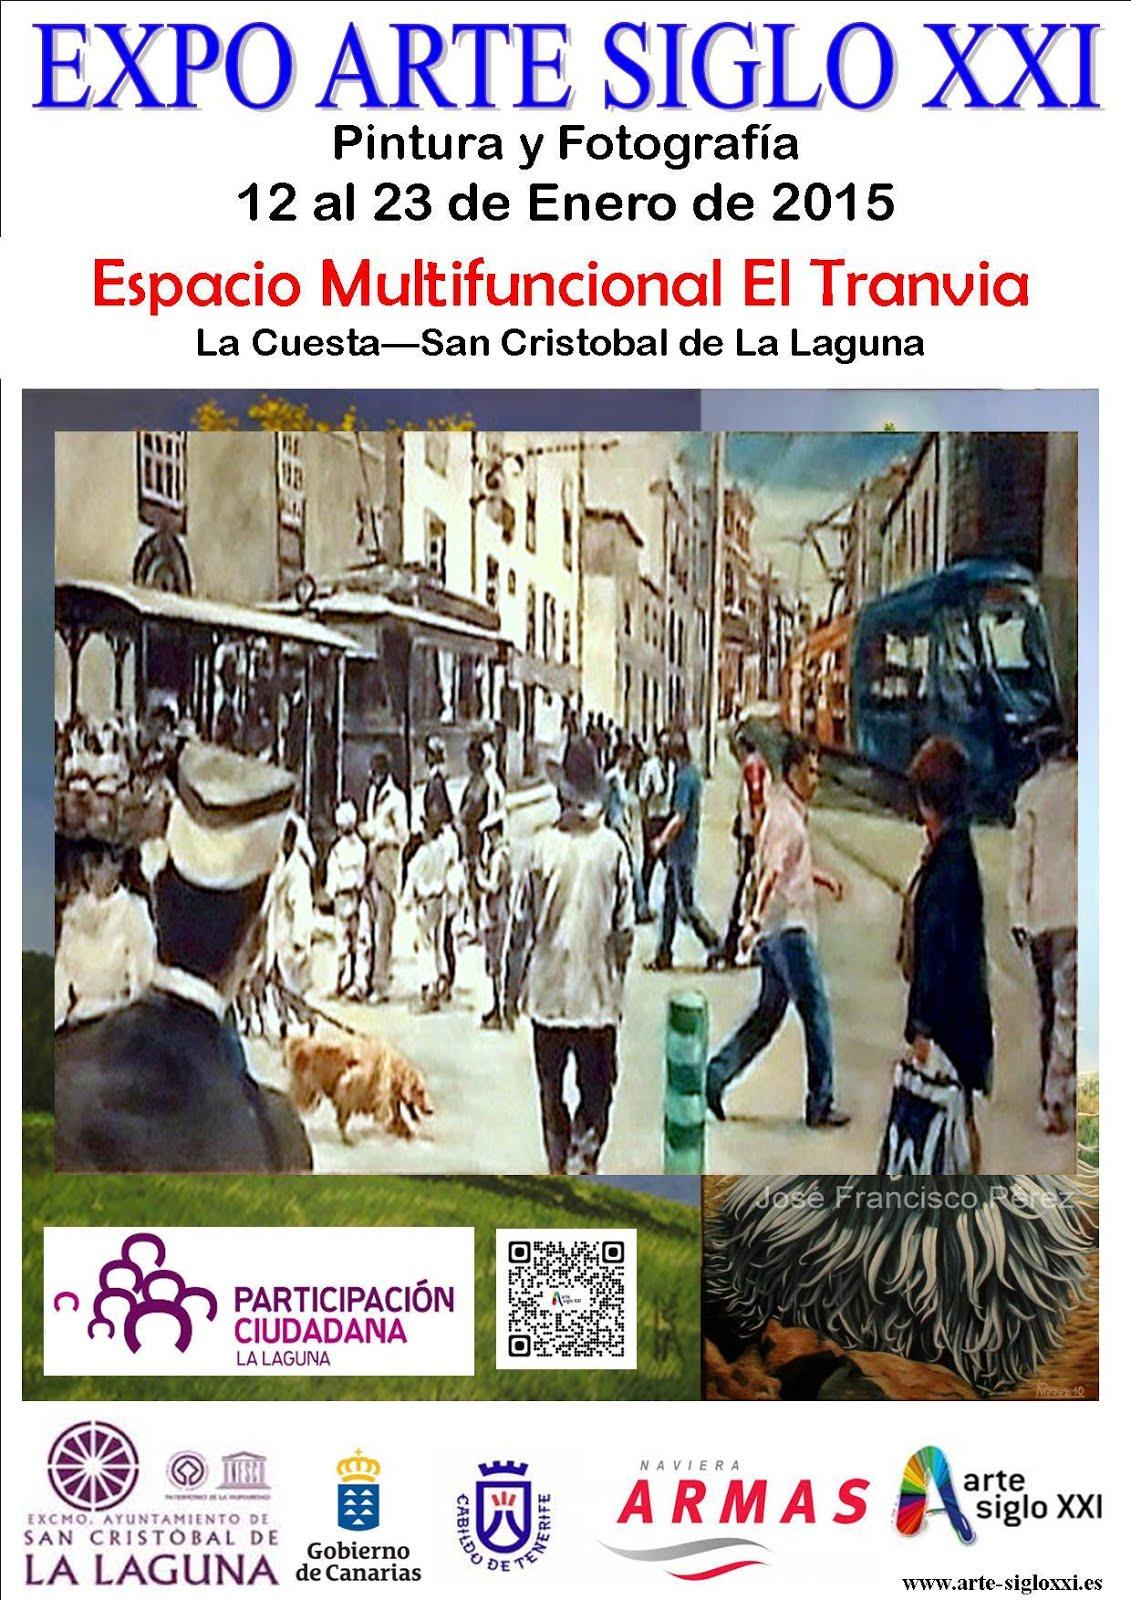 EXPO ARTE SIGLO XXI